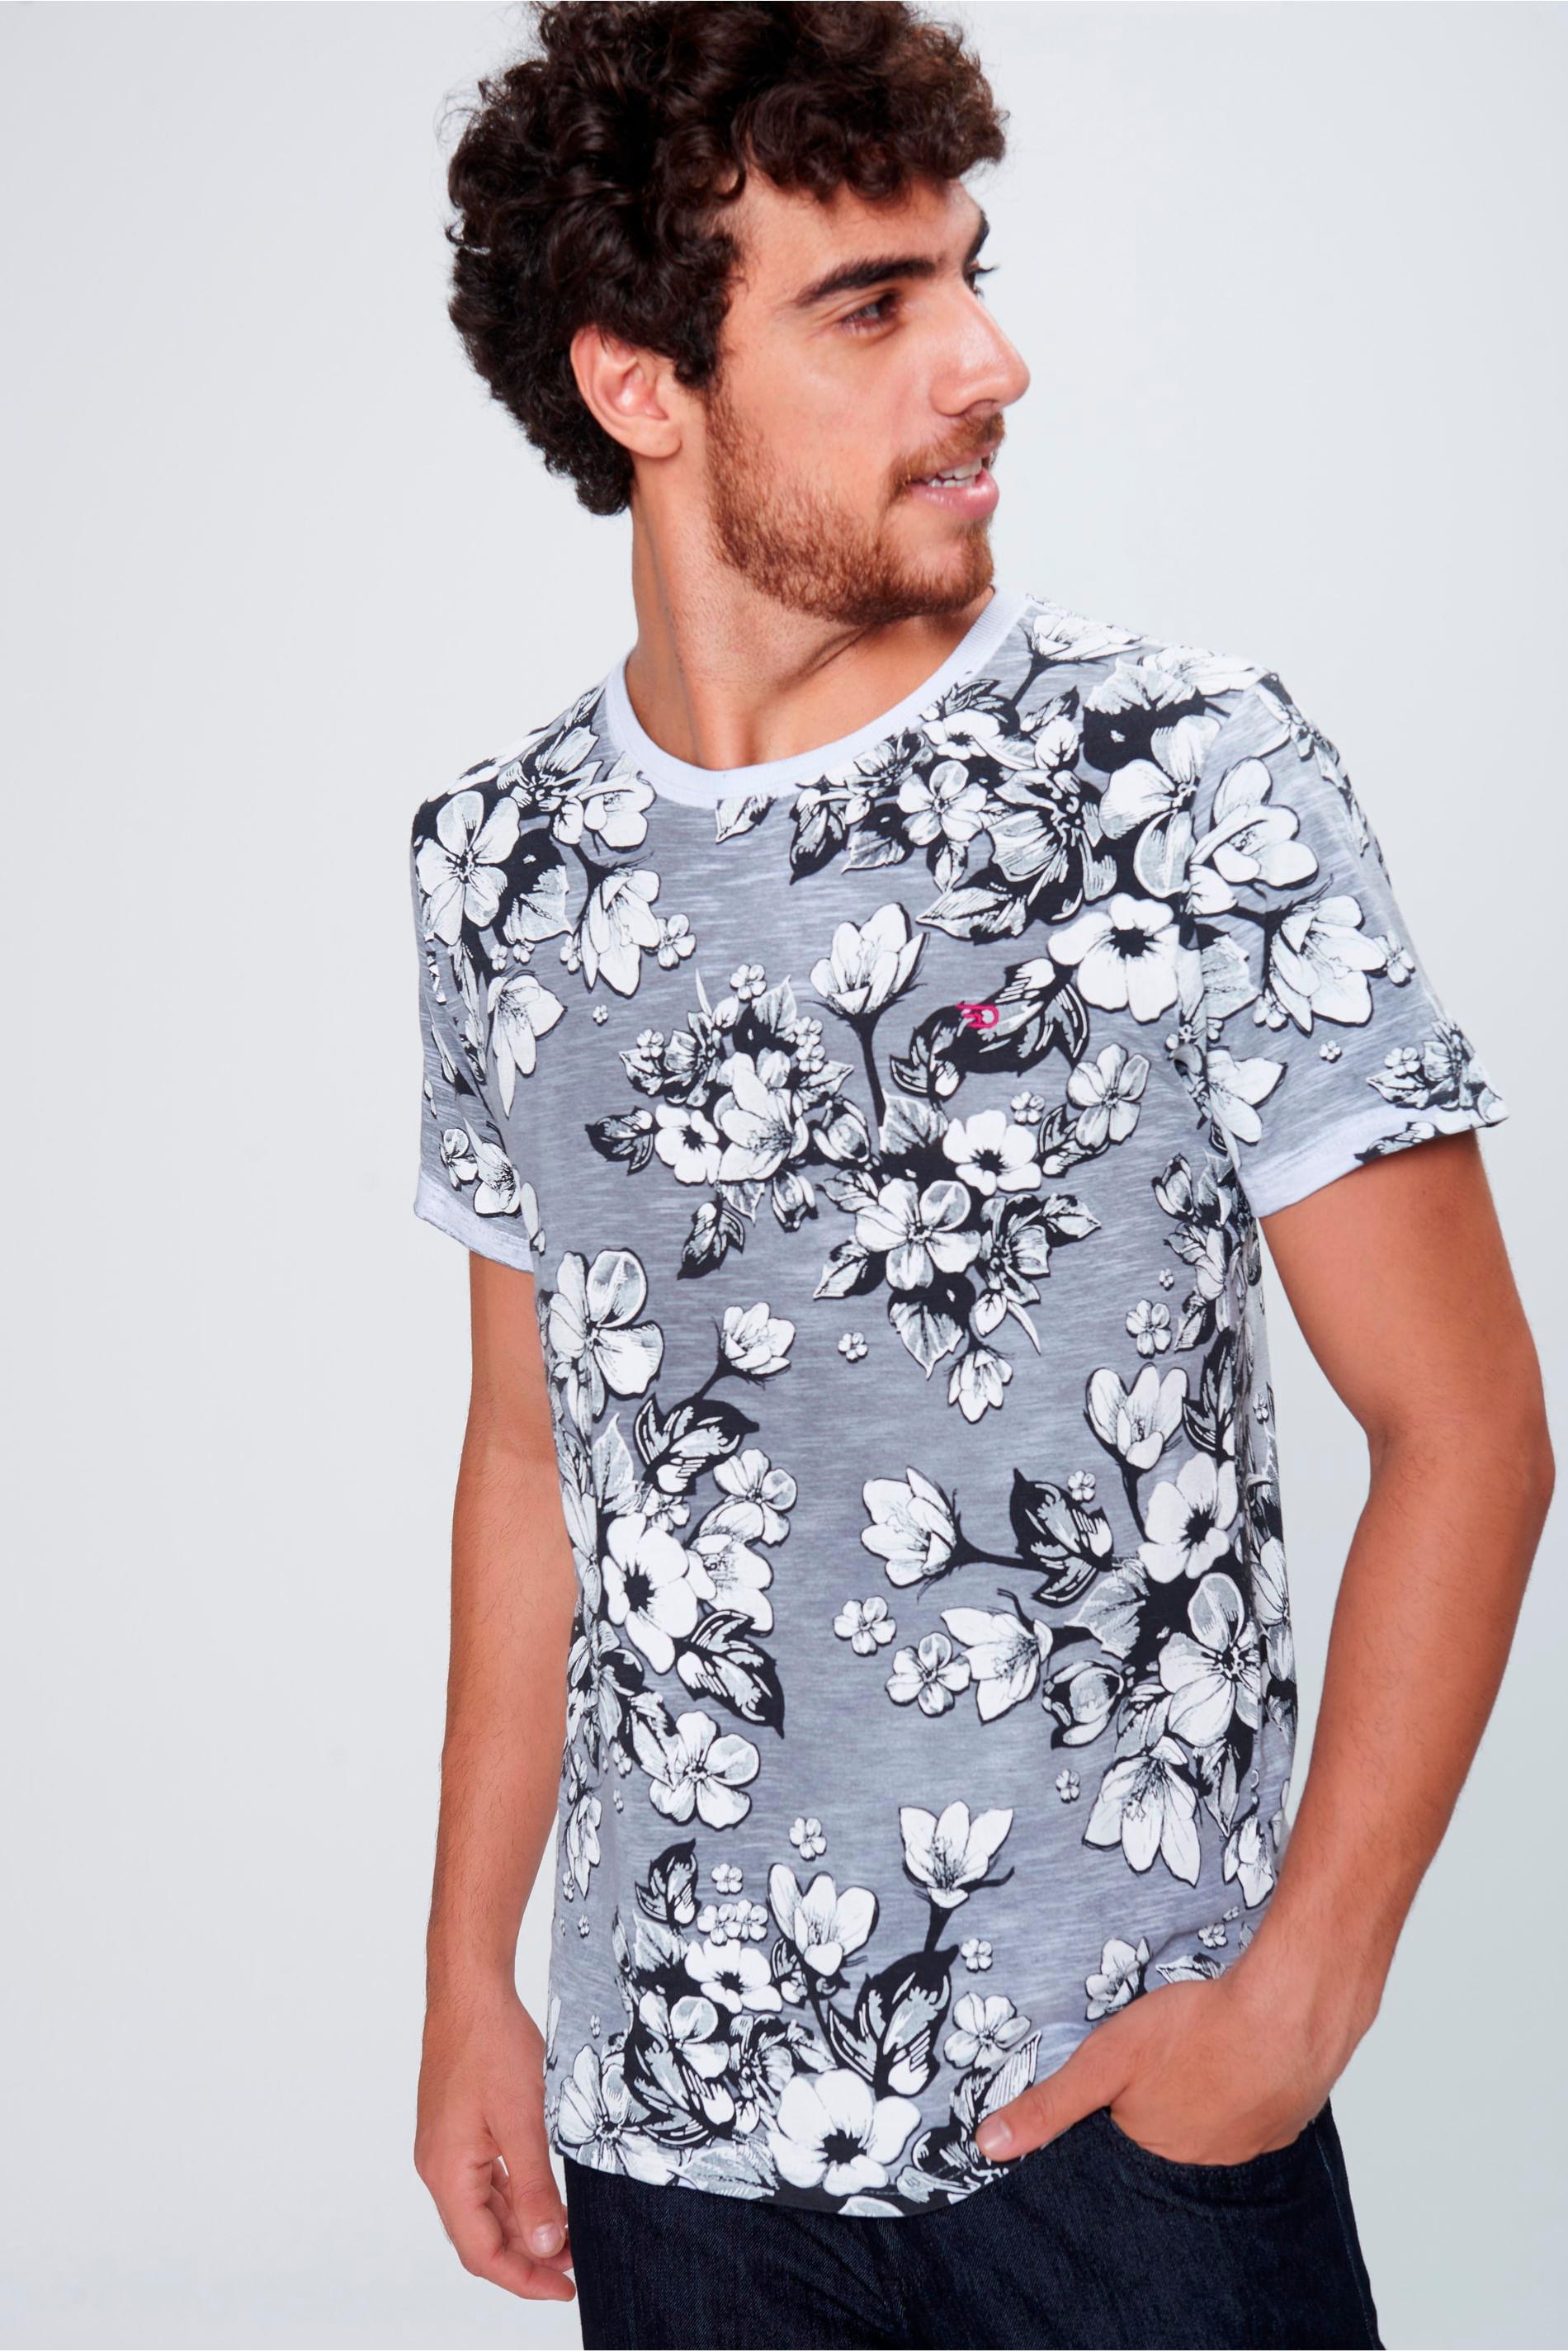 ba2986301f Damyller · Moda Masculina · Camiseta · Medium. abrir abrir